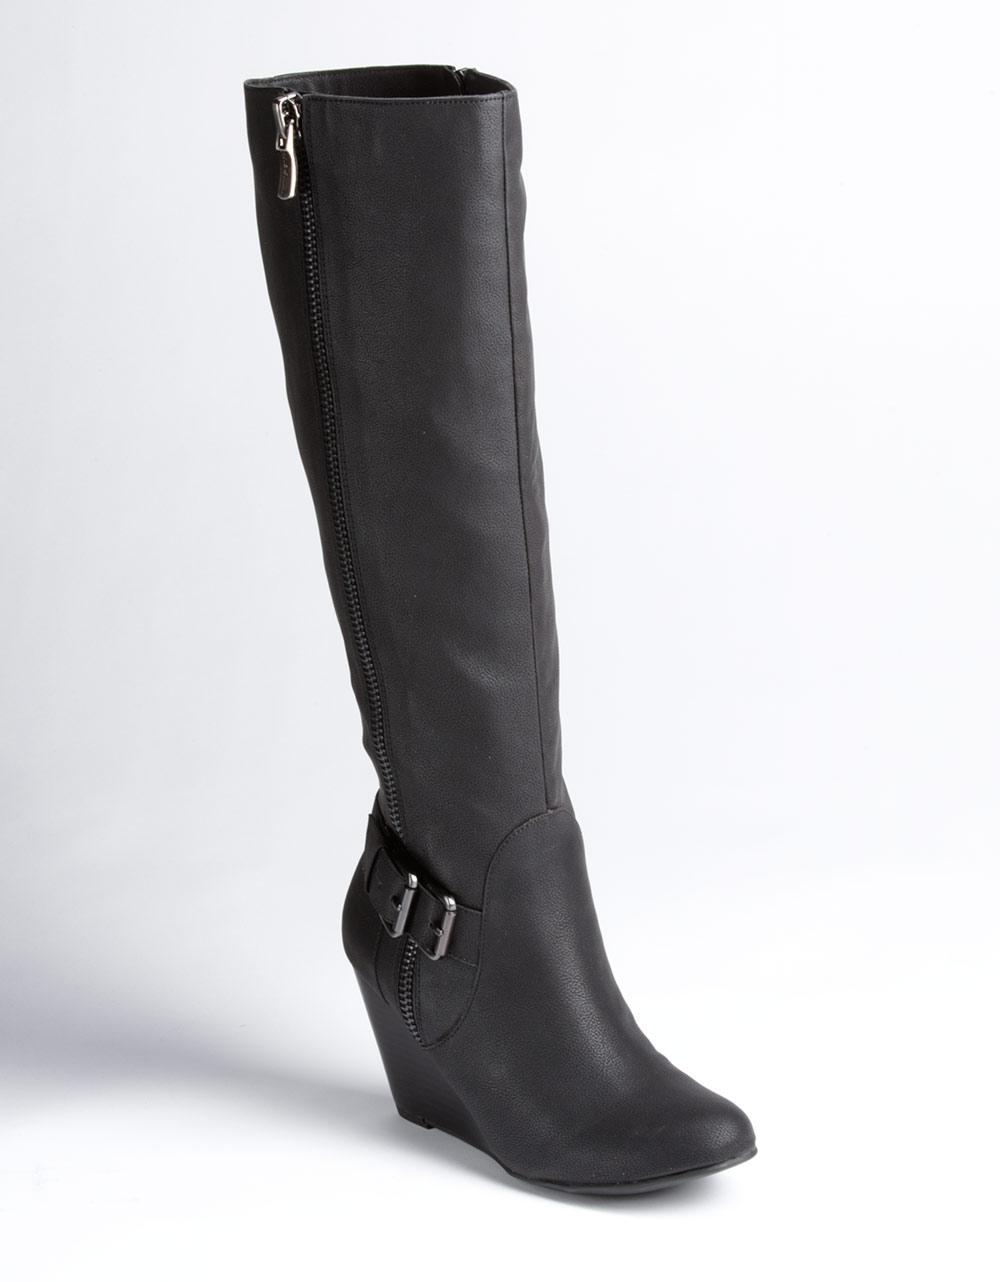 bcbgeneration watson wedge heel boots in black black